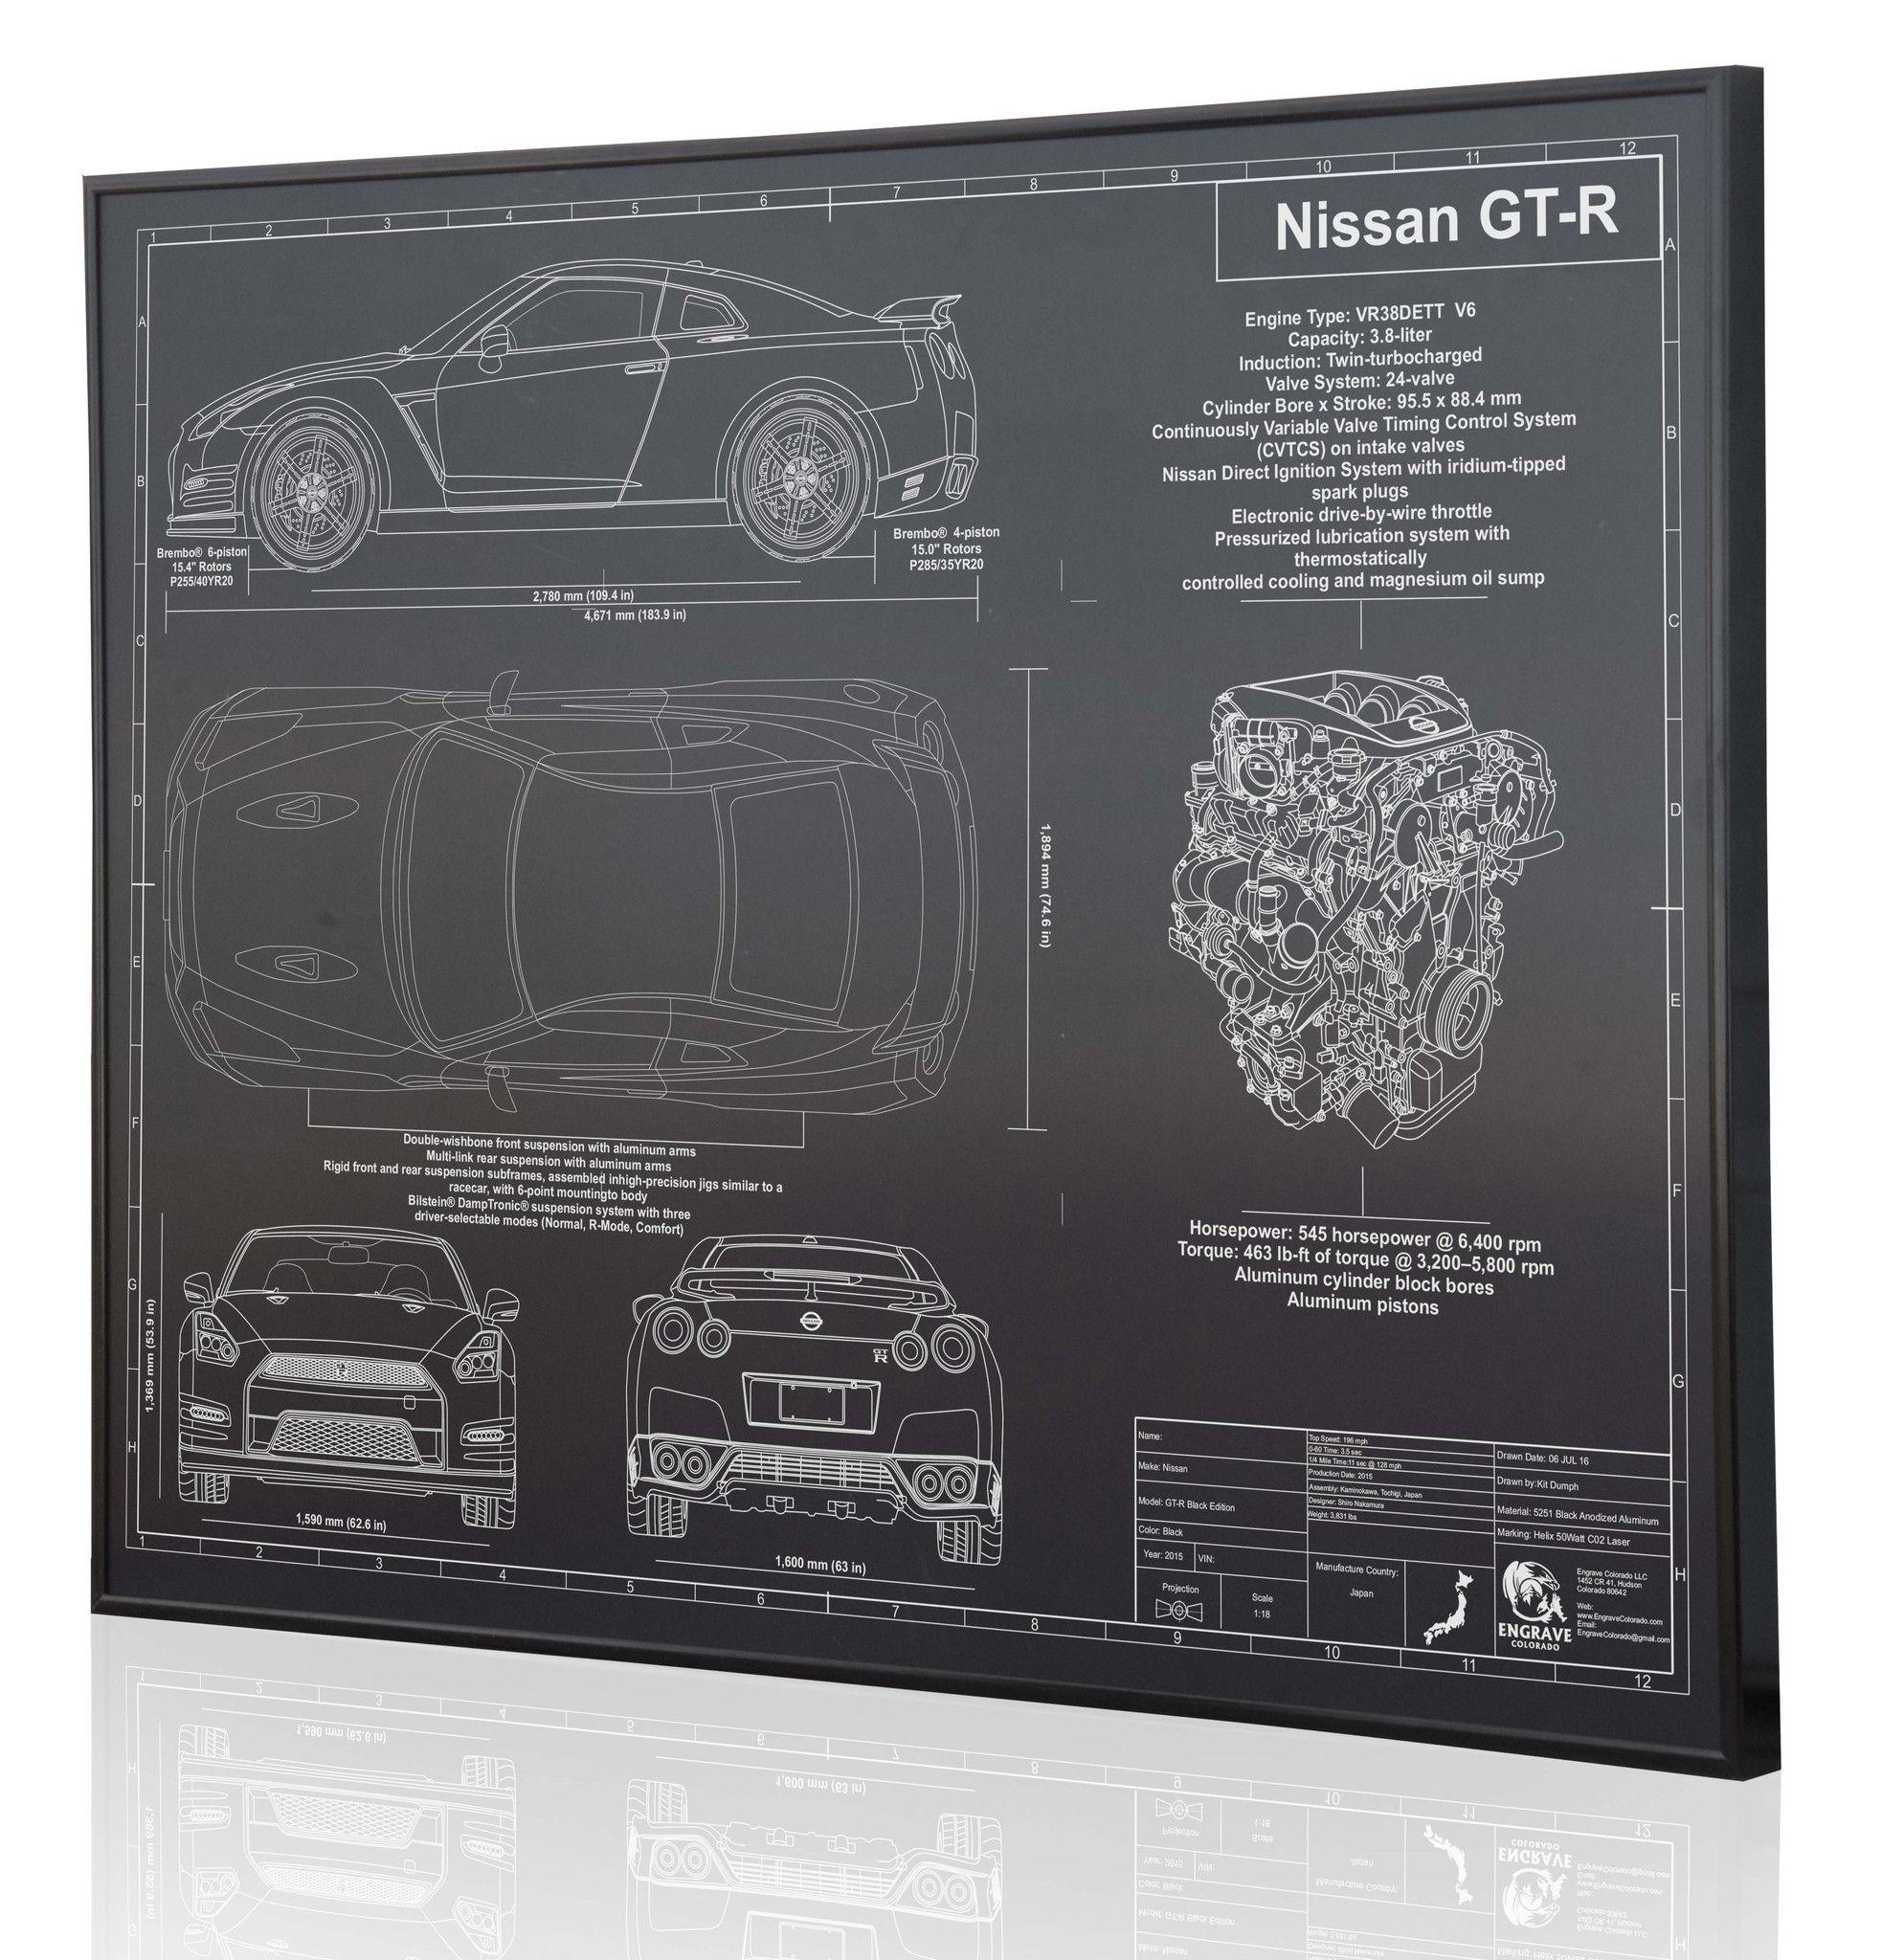 Nissan Gt R 2015 Gtr R35 Pinterest 3 8 Liter Gm Engine Diagram Bmw Laser Engraved Blueprint Artwork On Anodized Aluminum